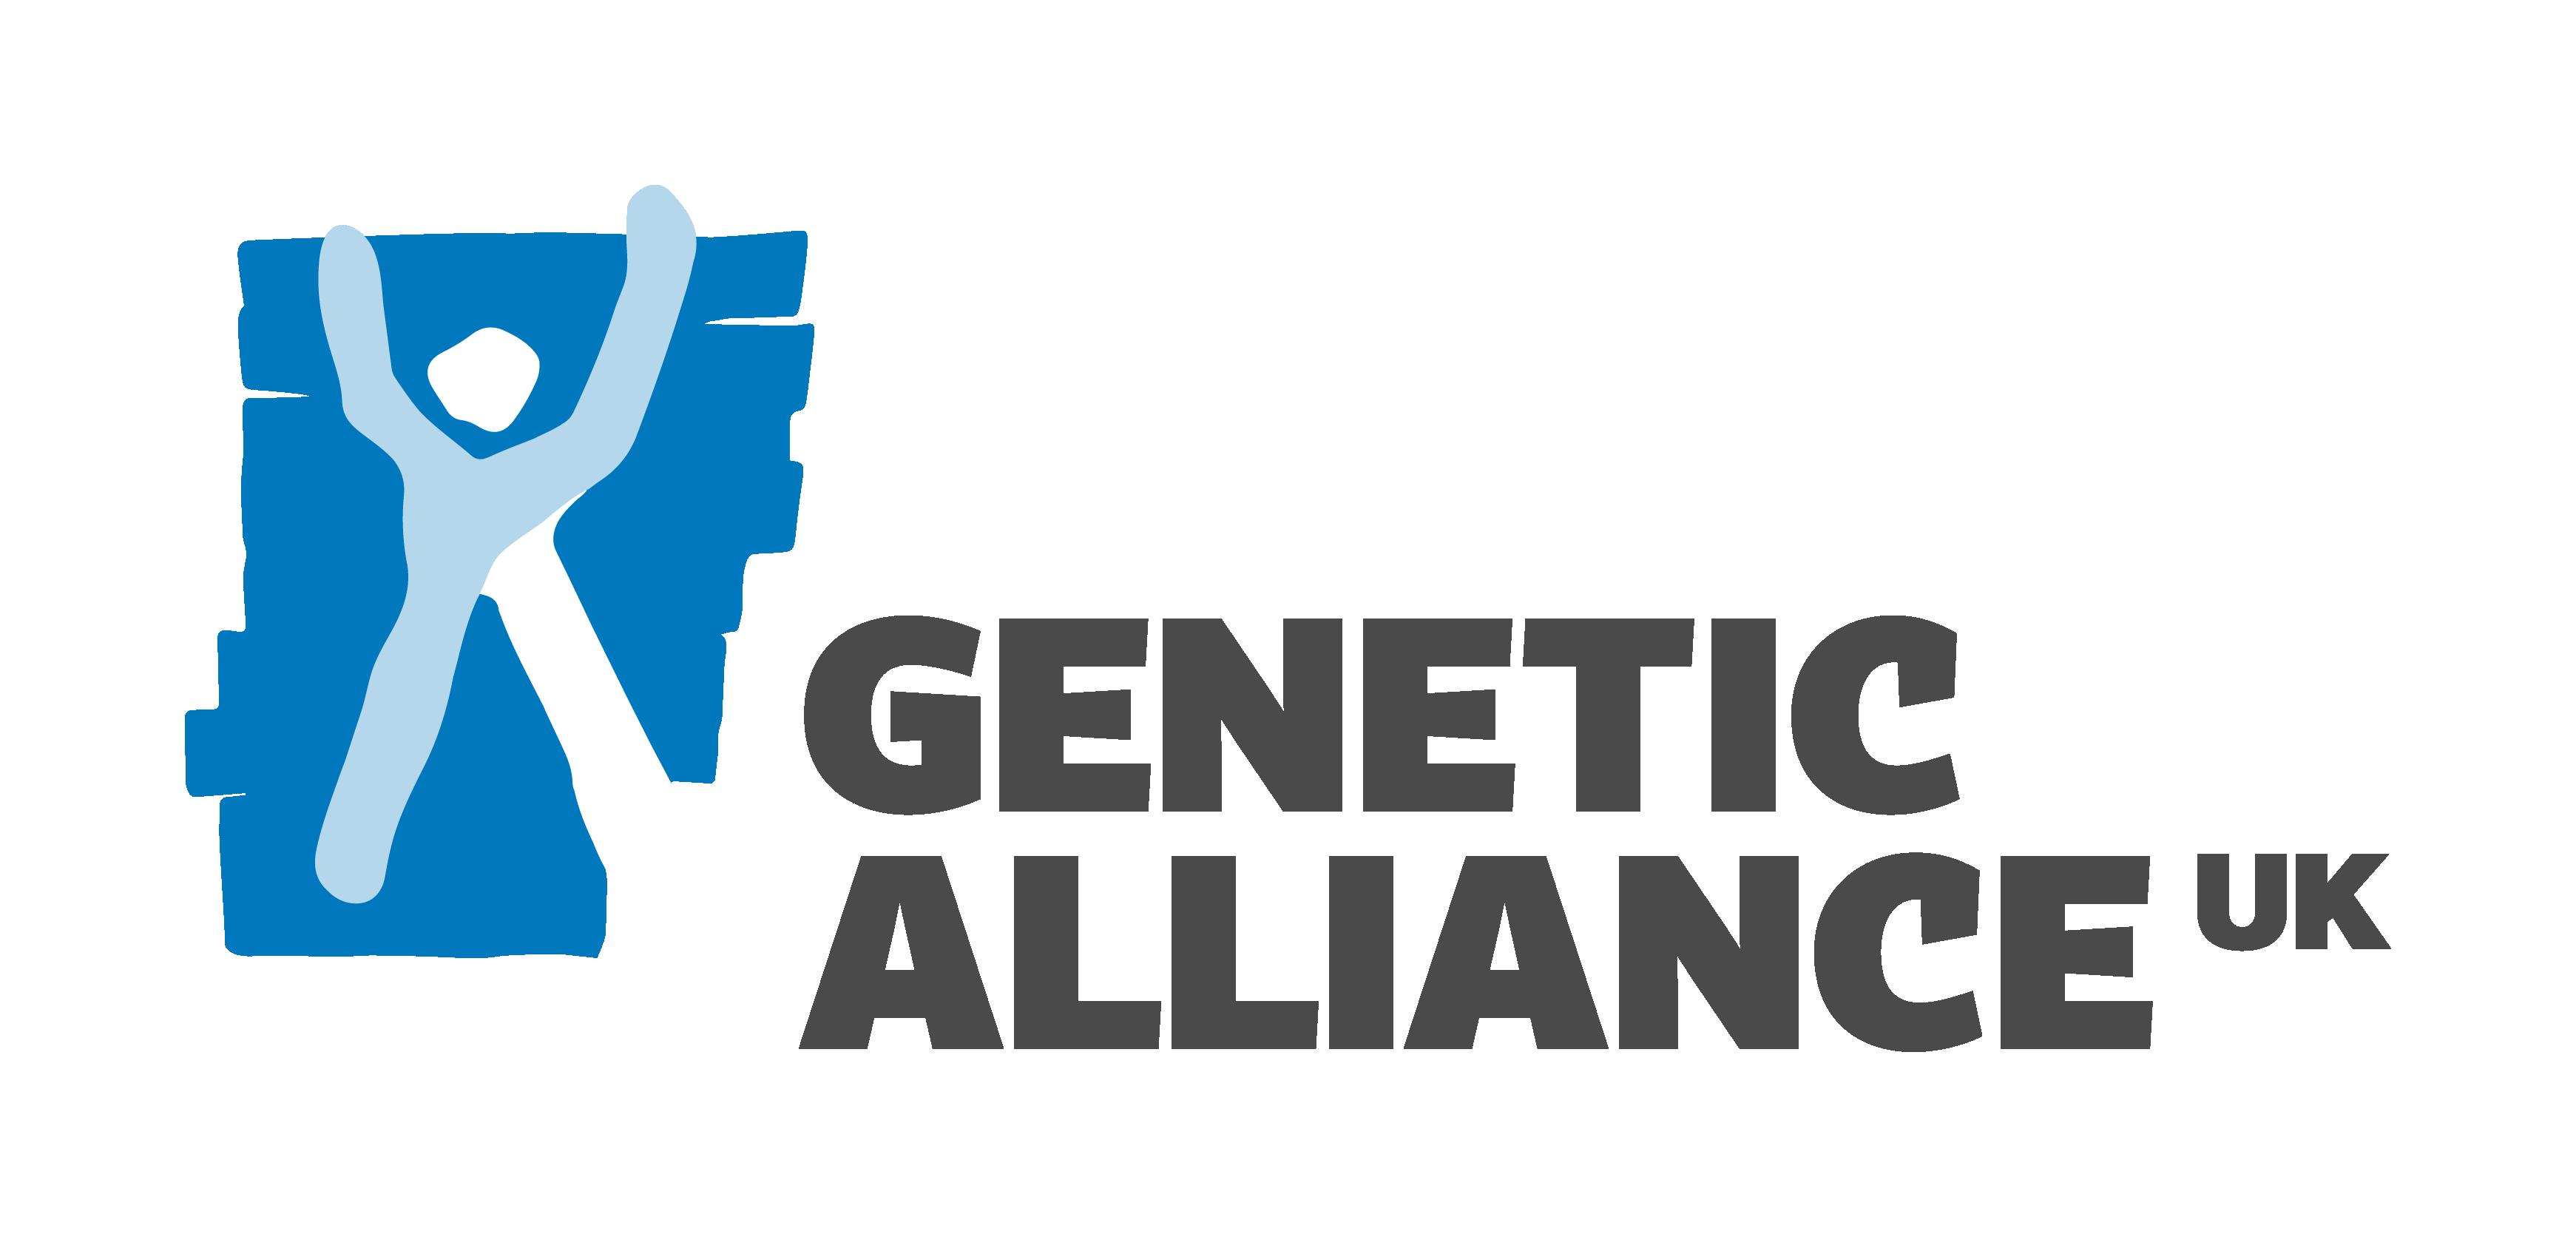 Logo: Genetic Alliance UK